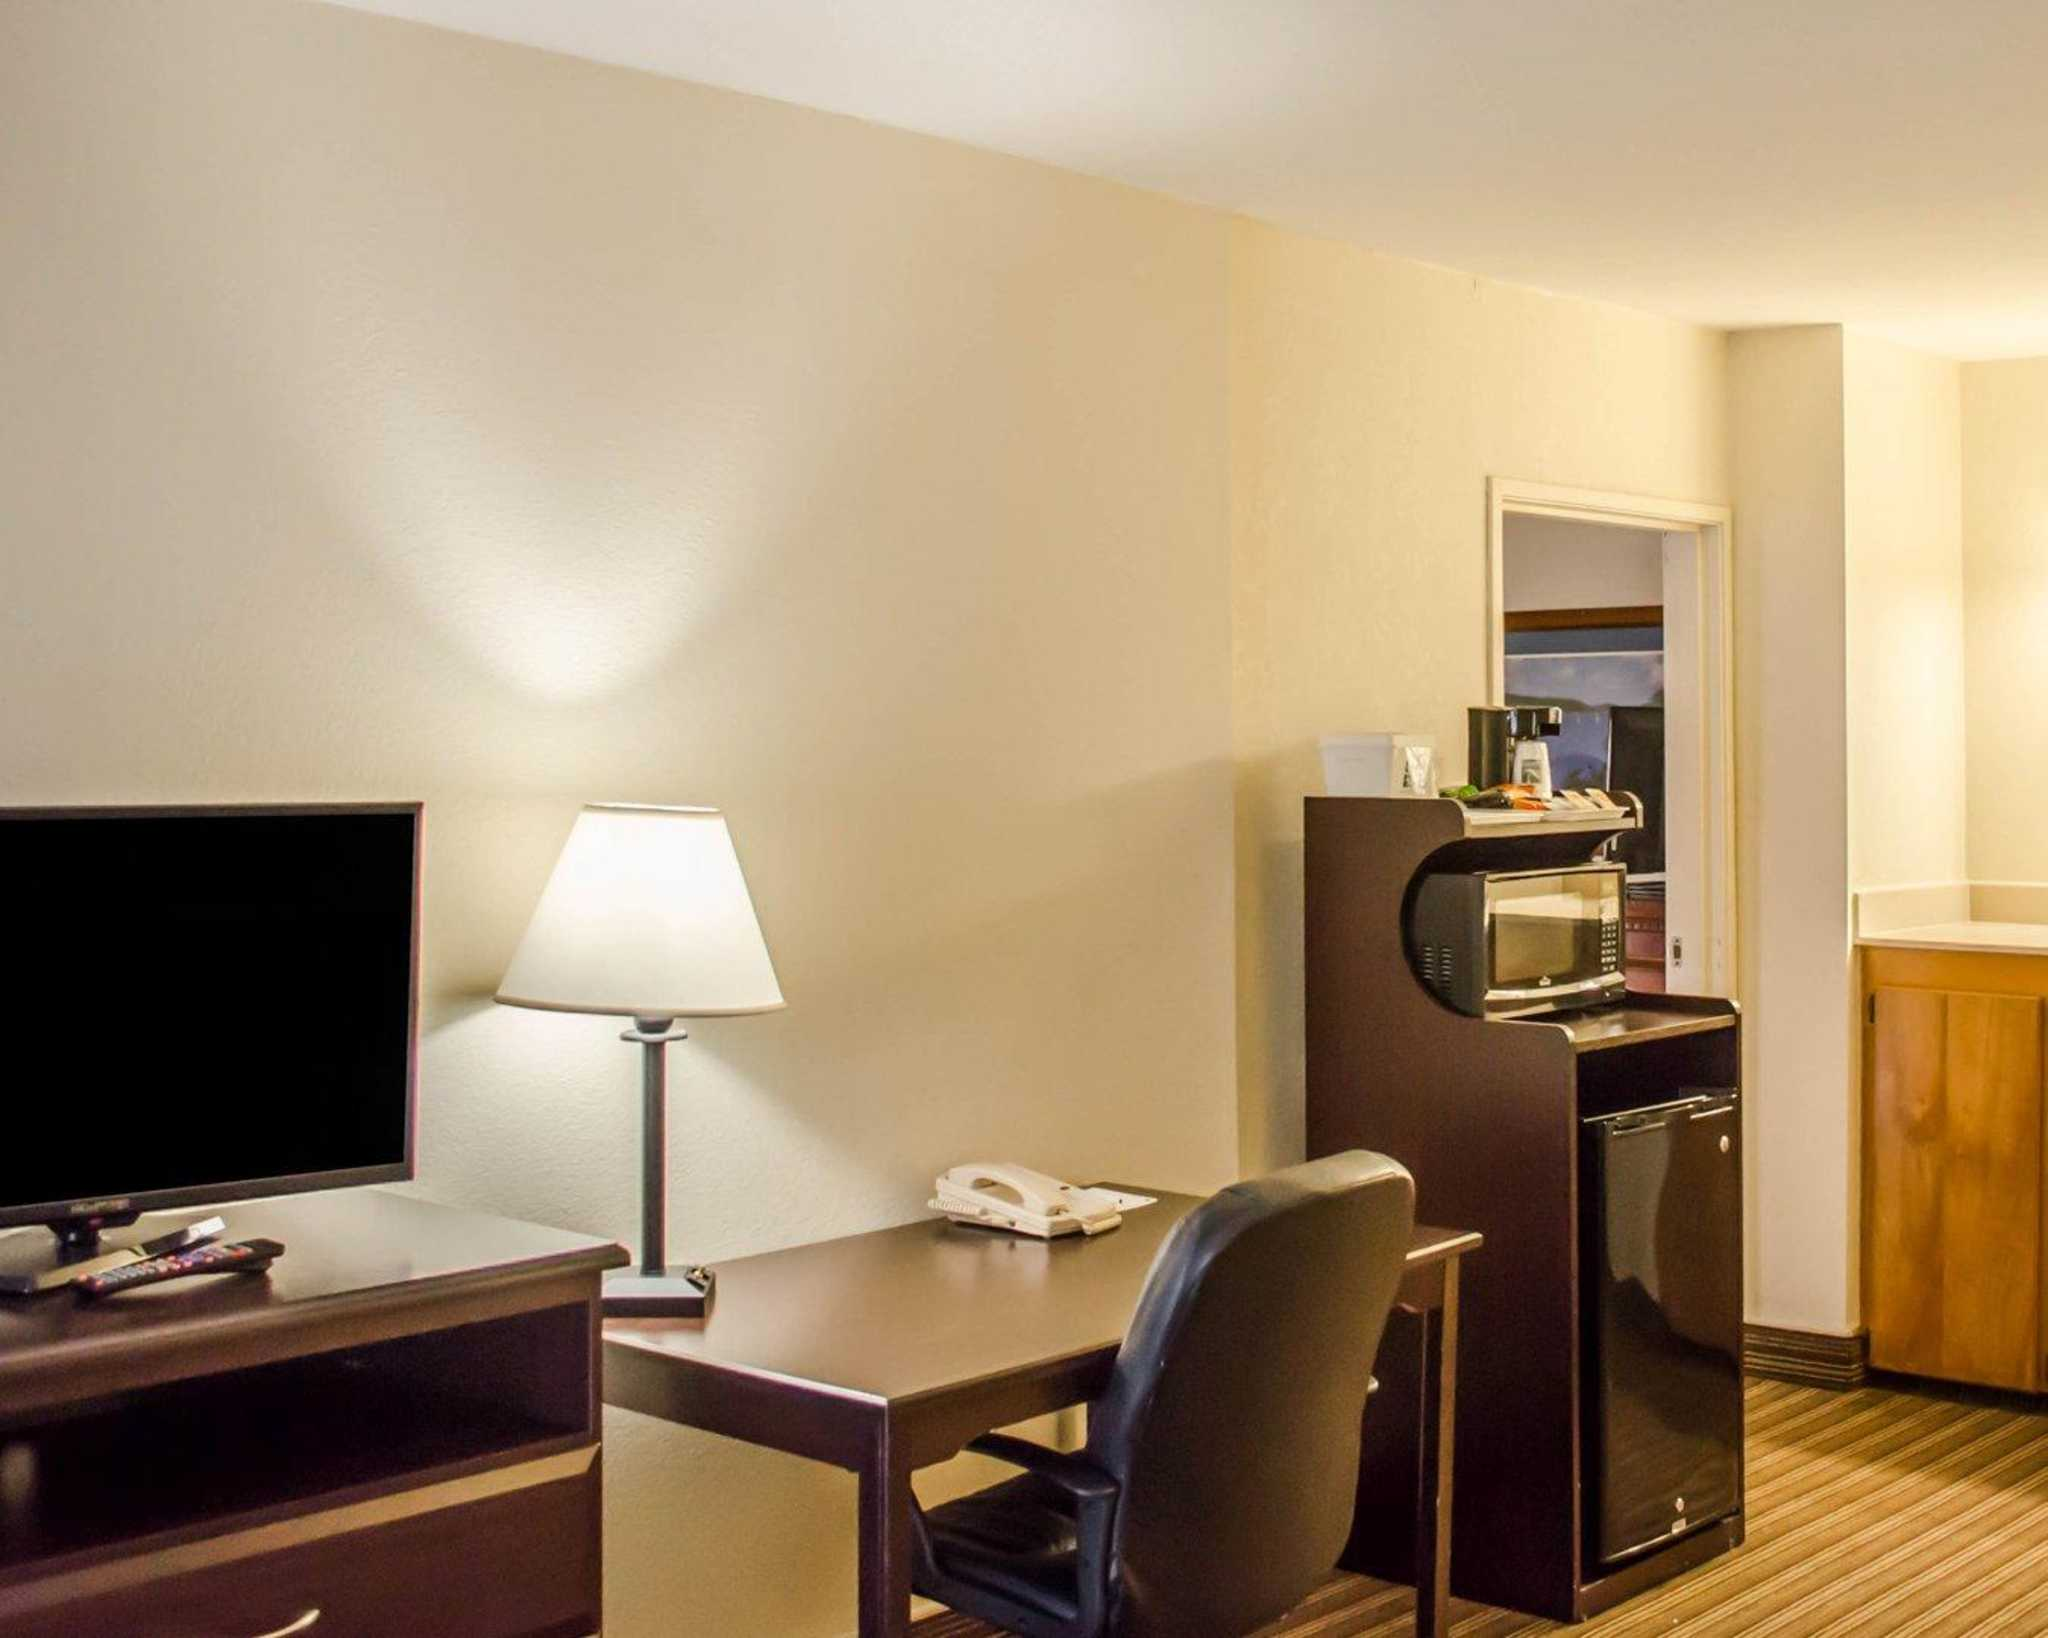 Quality Inn & Suites Pensacola Bayview in Pensacola, FL, photo #15